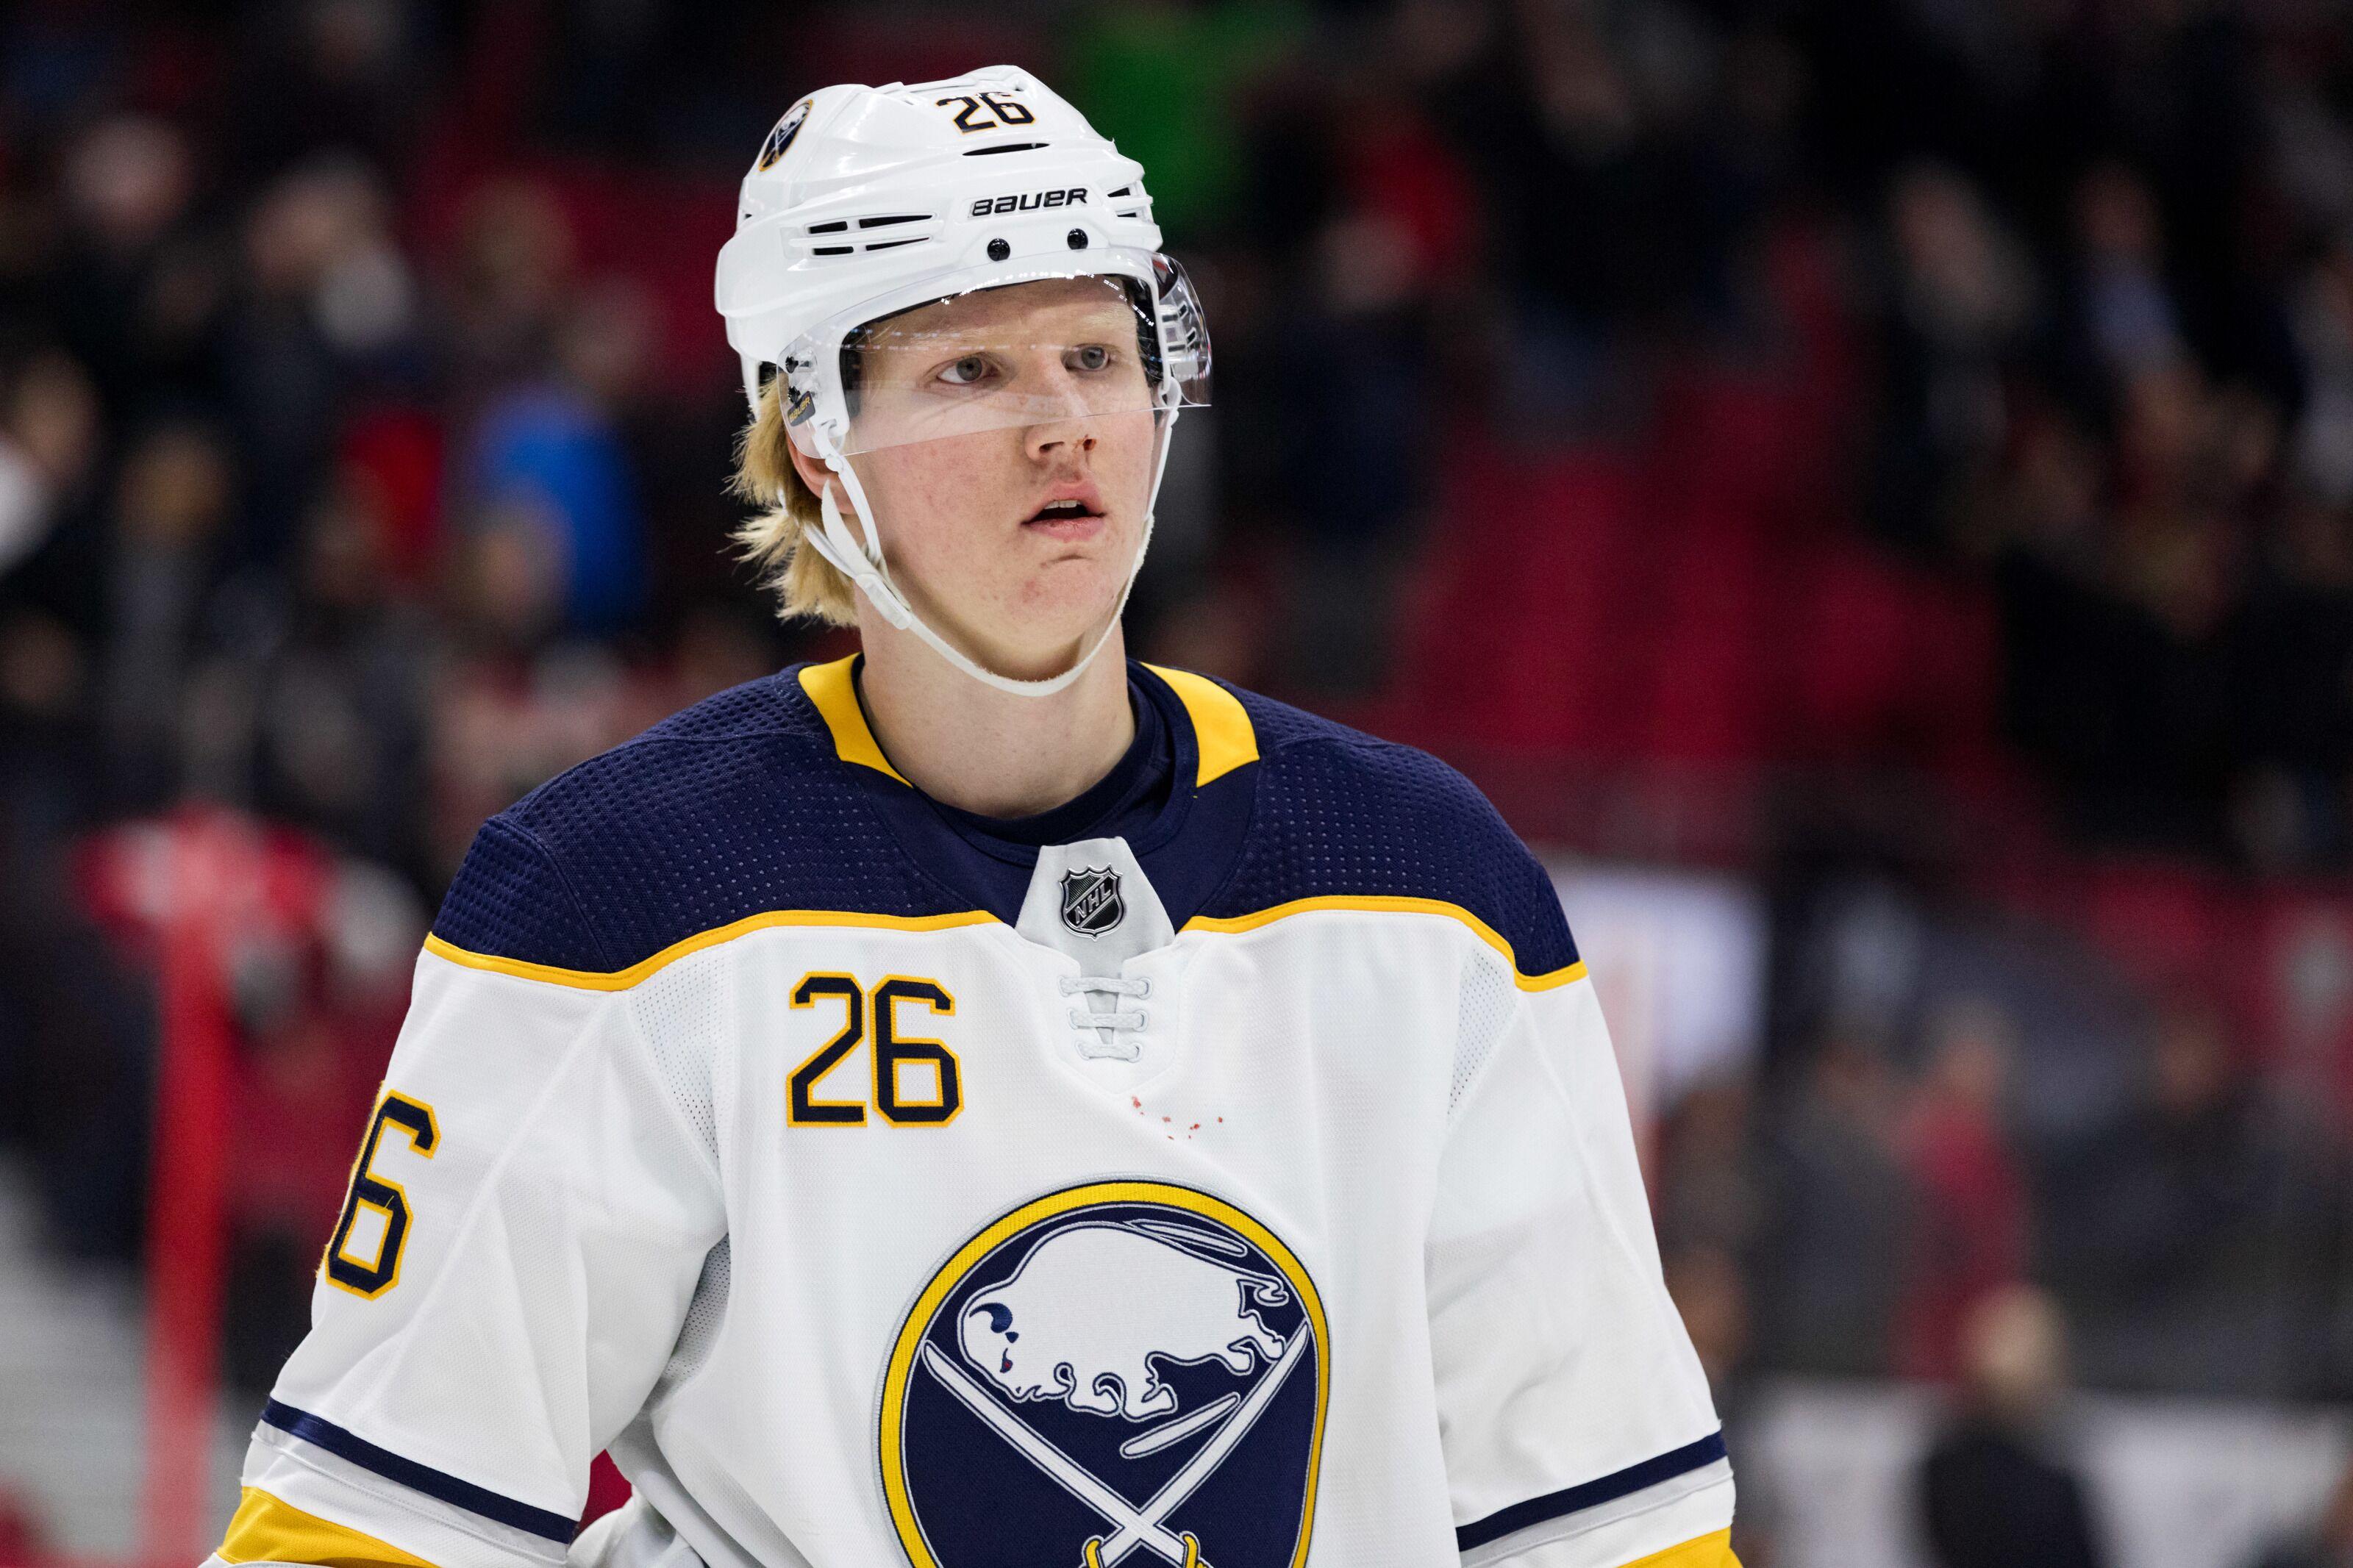 Buffalo Sabres: Rasmus Dahlin guarantees team will make playoffs